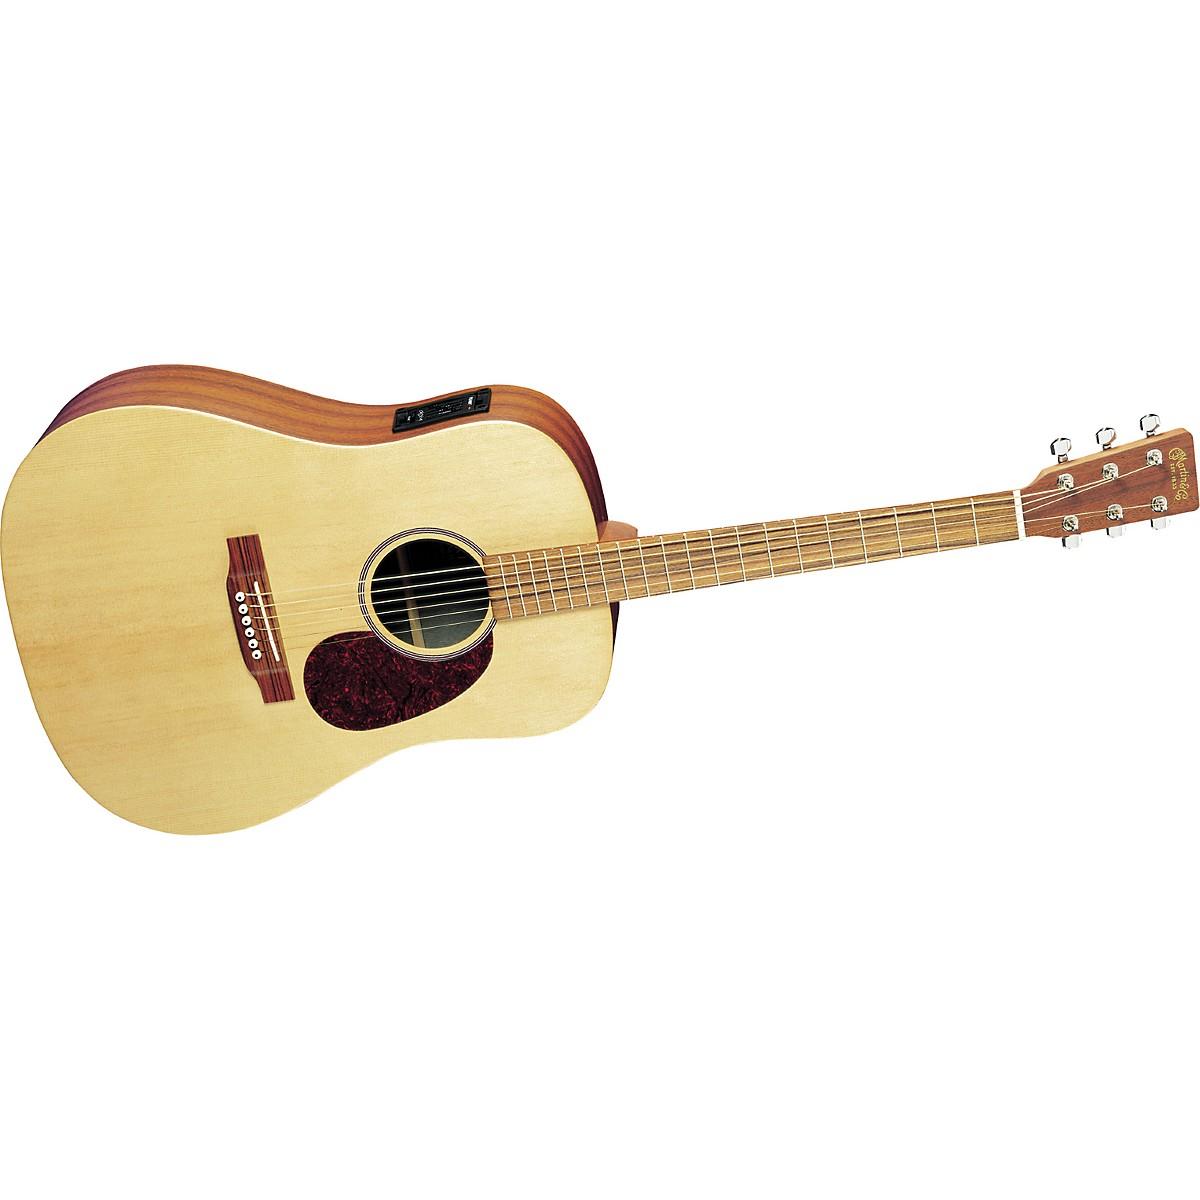 Martin DX1E Dreadnought Acoustic-Electric Guitar